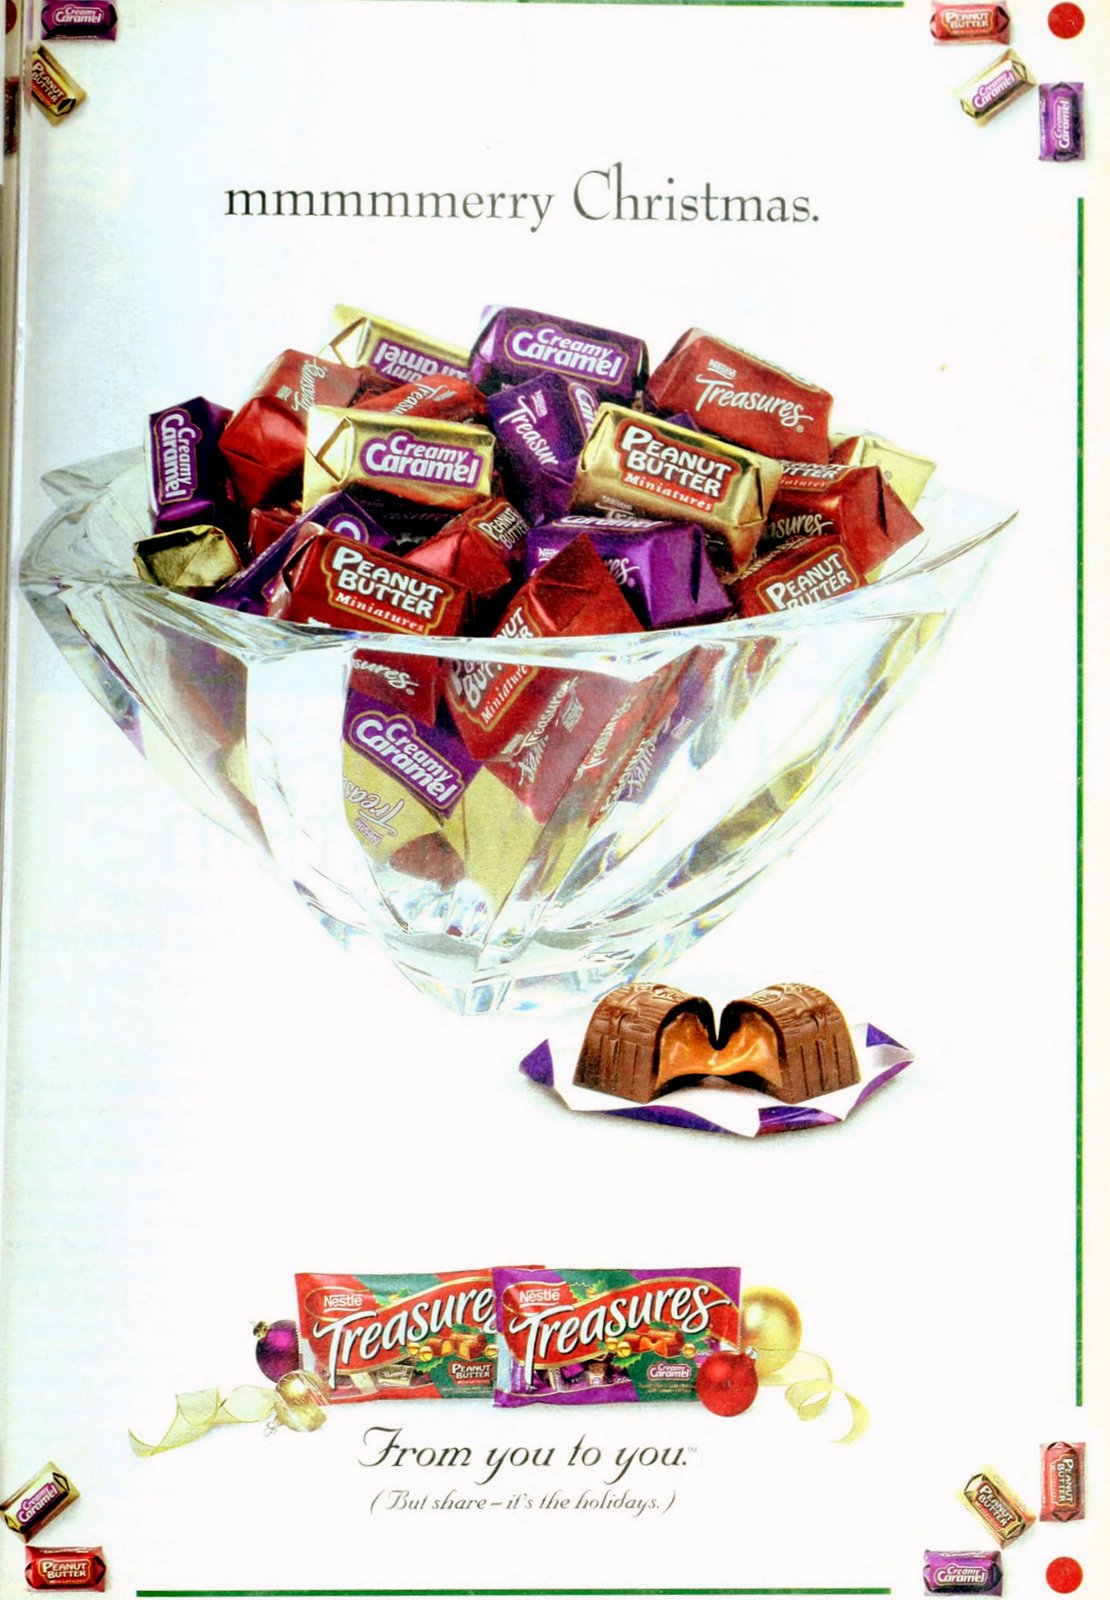 Nestle Treasures candy (1999)